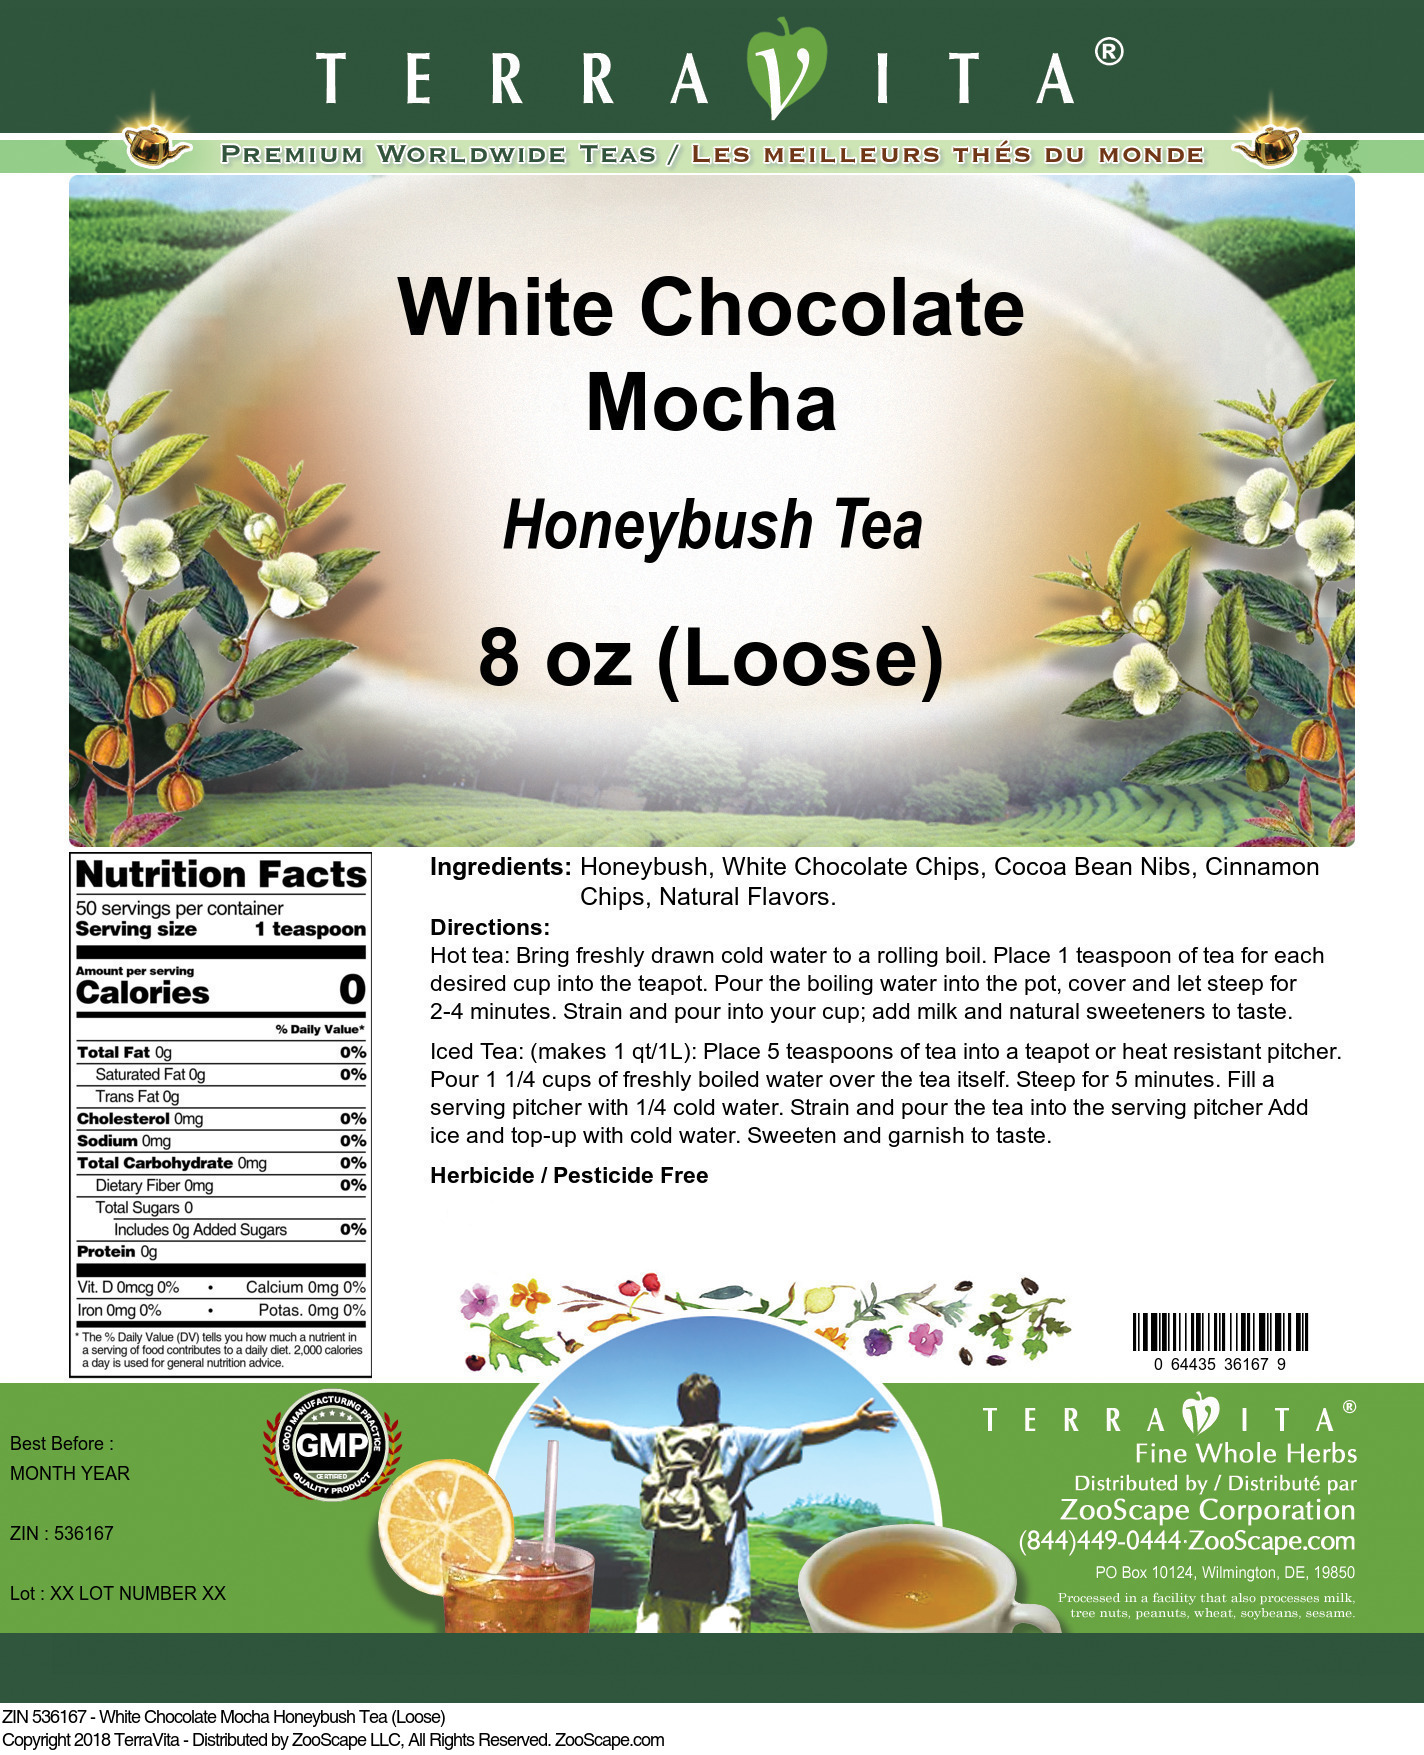 White Chocolate Mocha Honeybush Tea